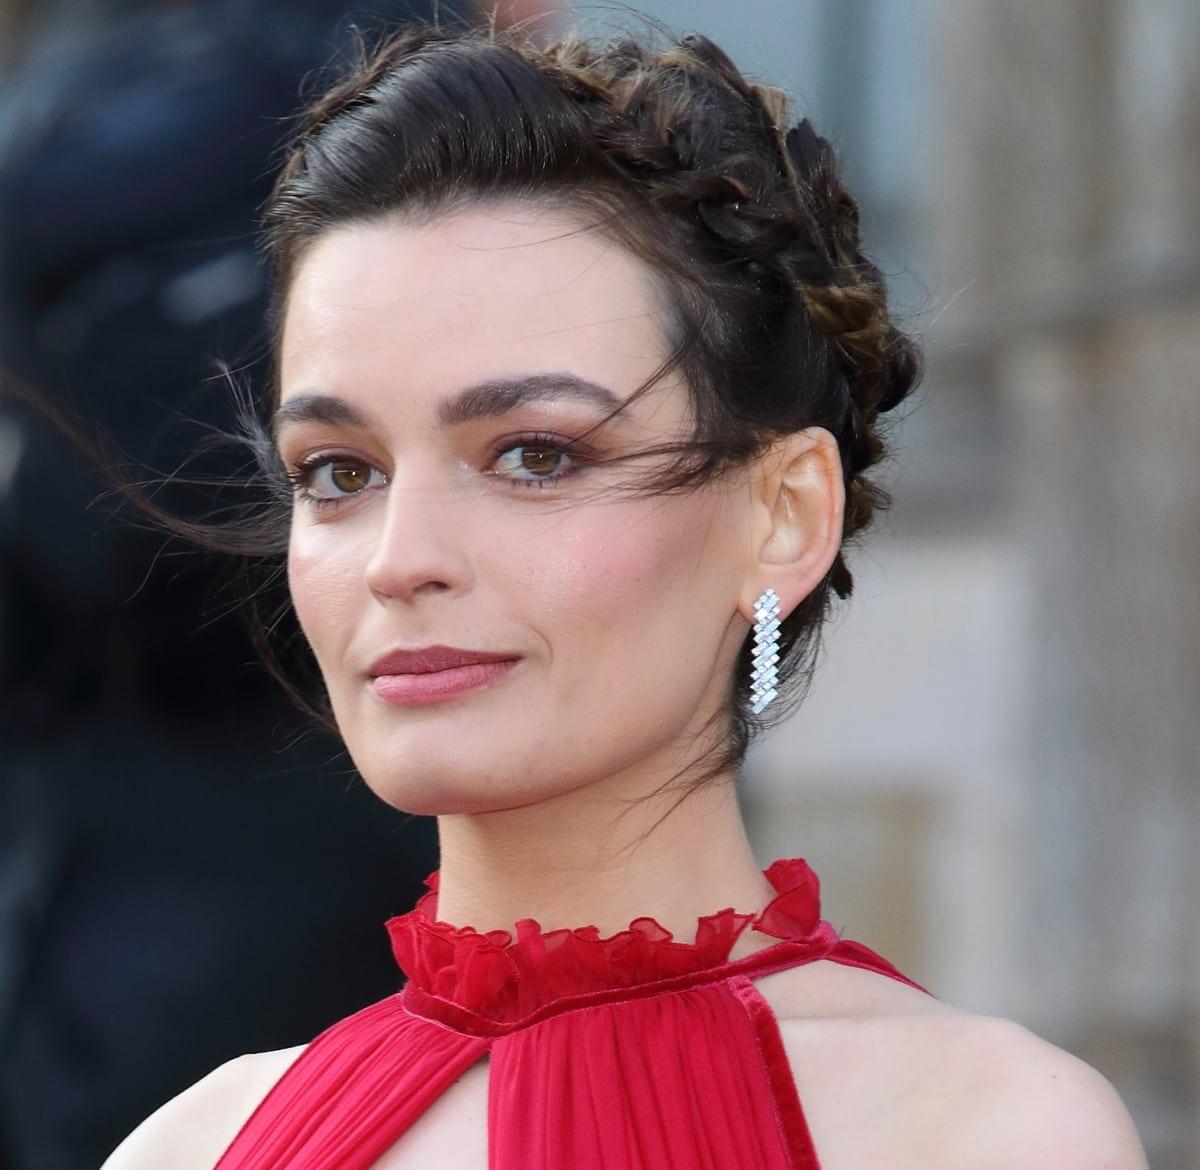 Fans think Emma Mackey resembles Jaime Pressly and Margot Robbie